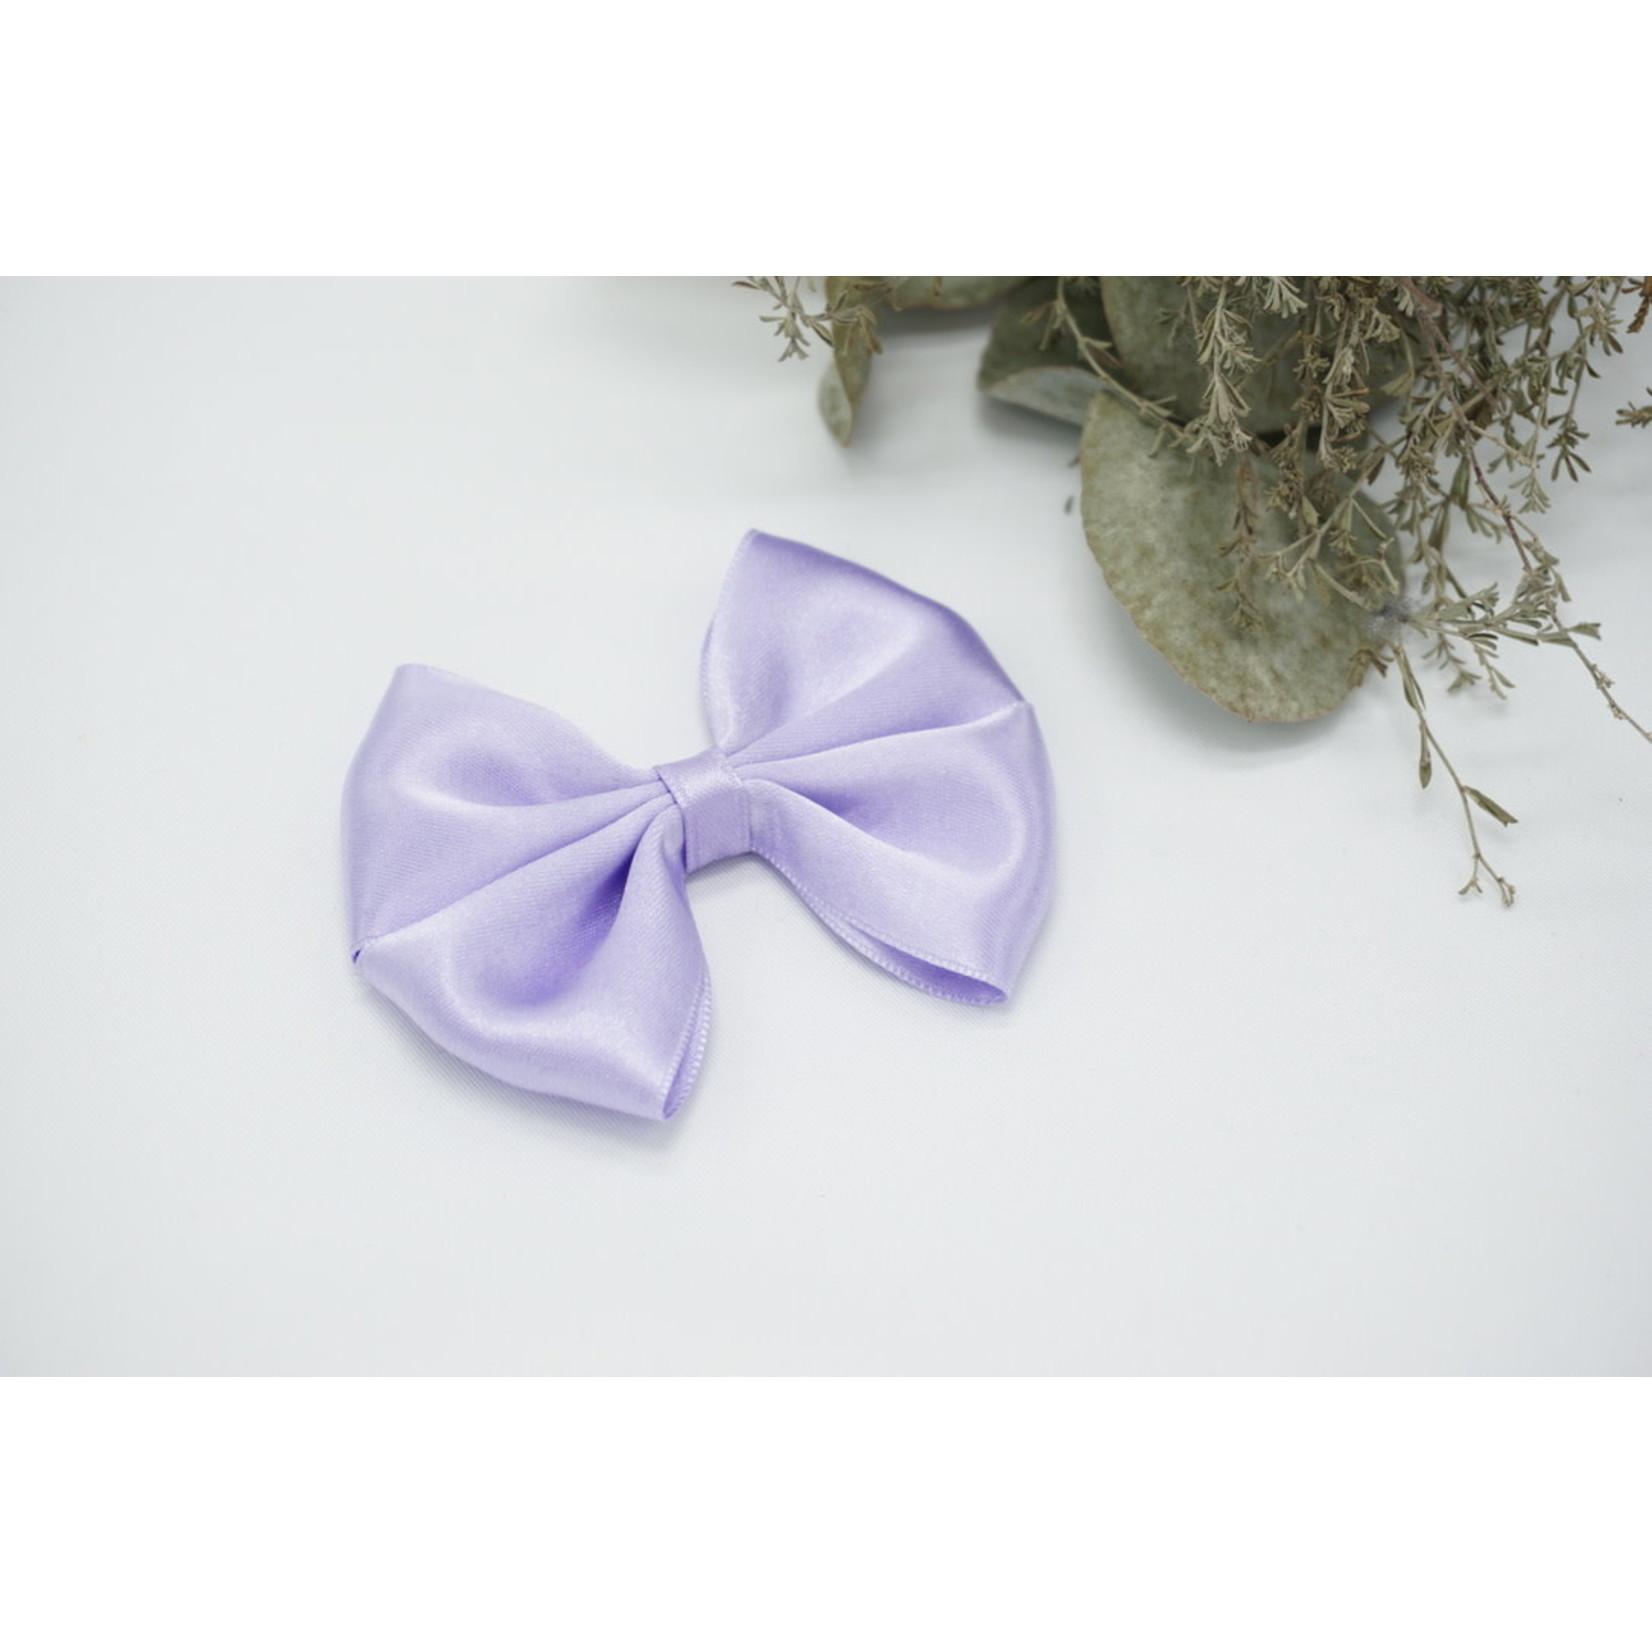 Petite Zara Satin Bow - Lilac